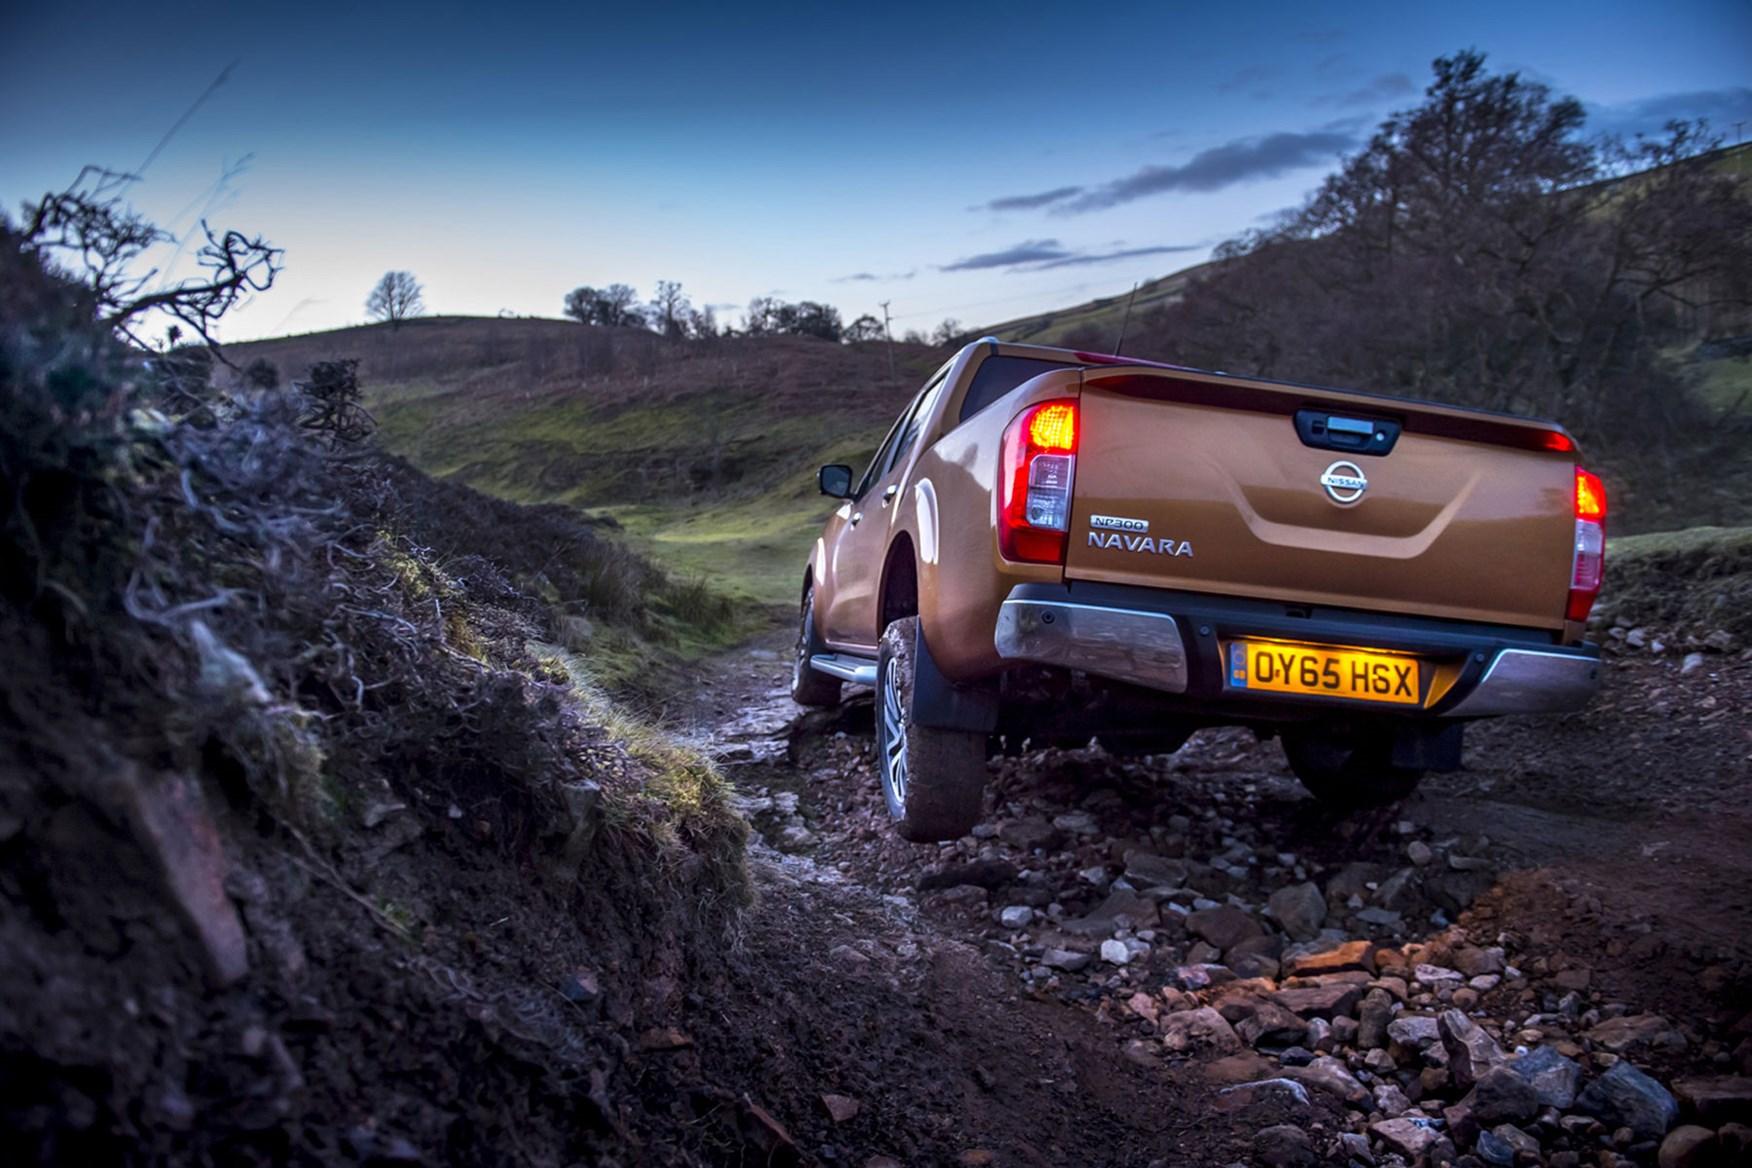 Nissan Navara review - rear view, orange, driving off-road